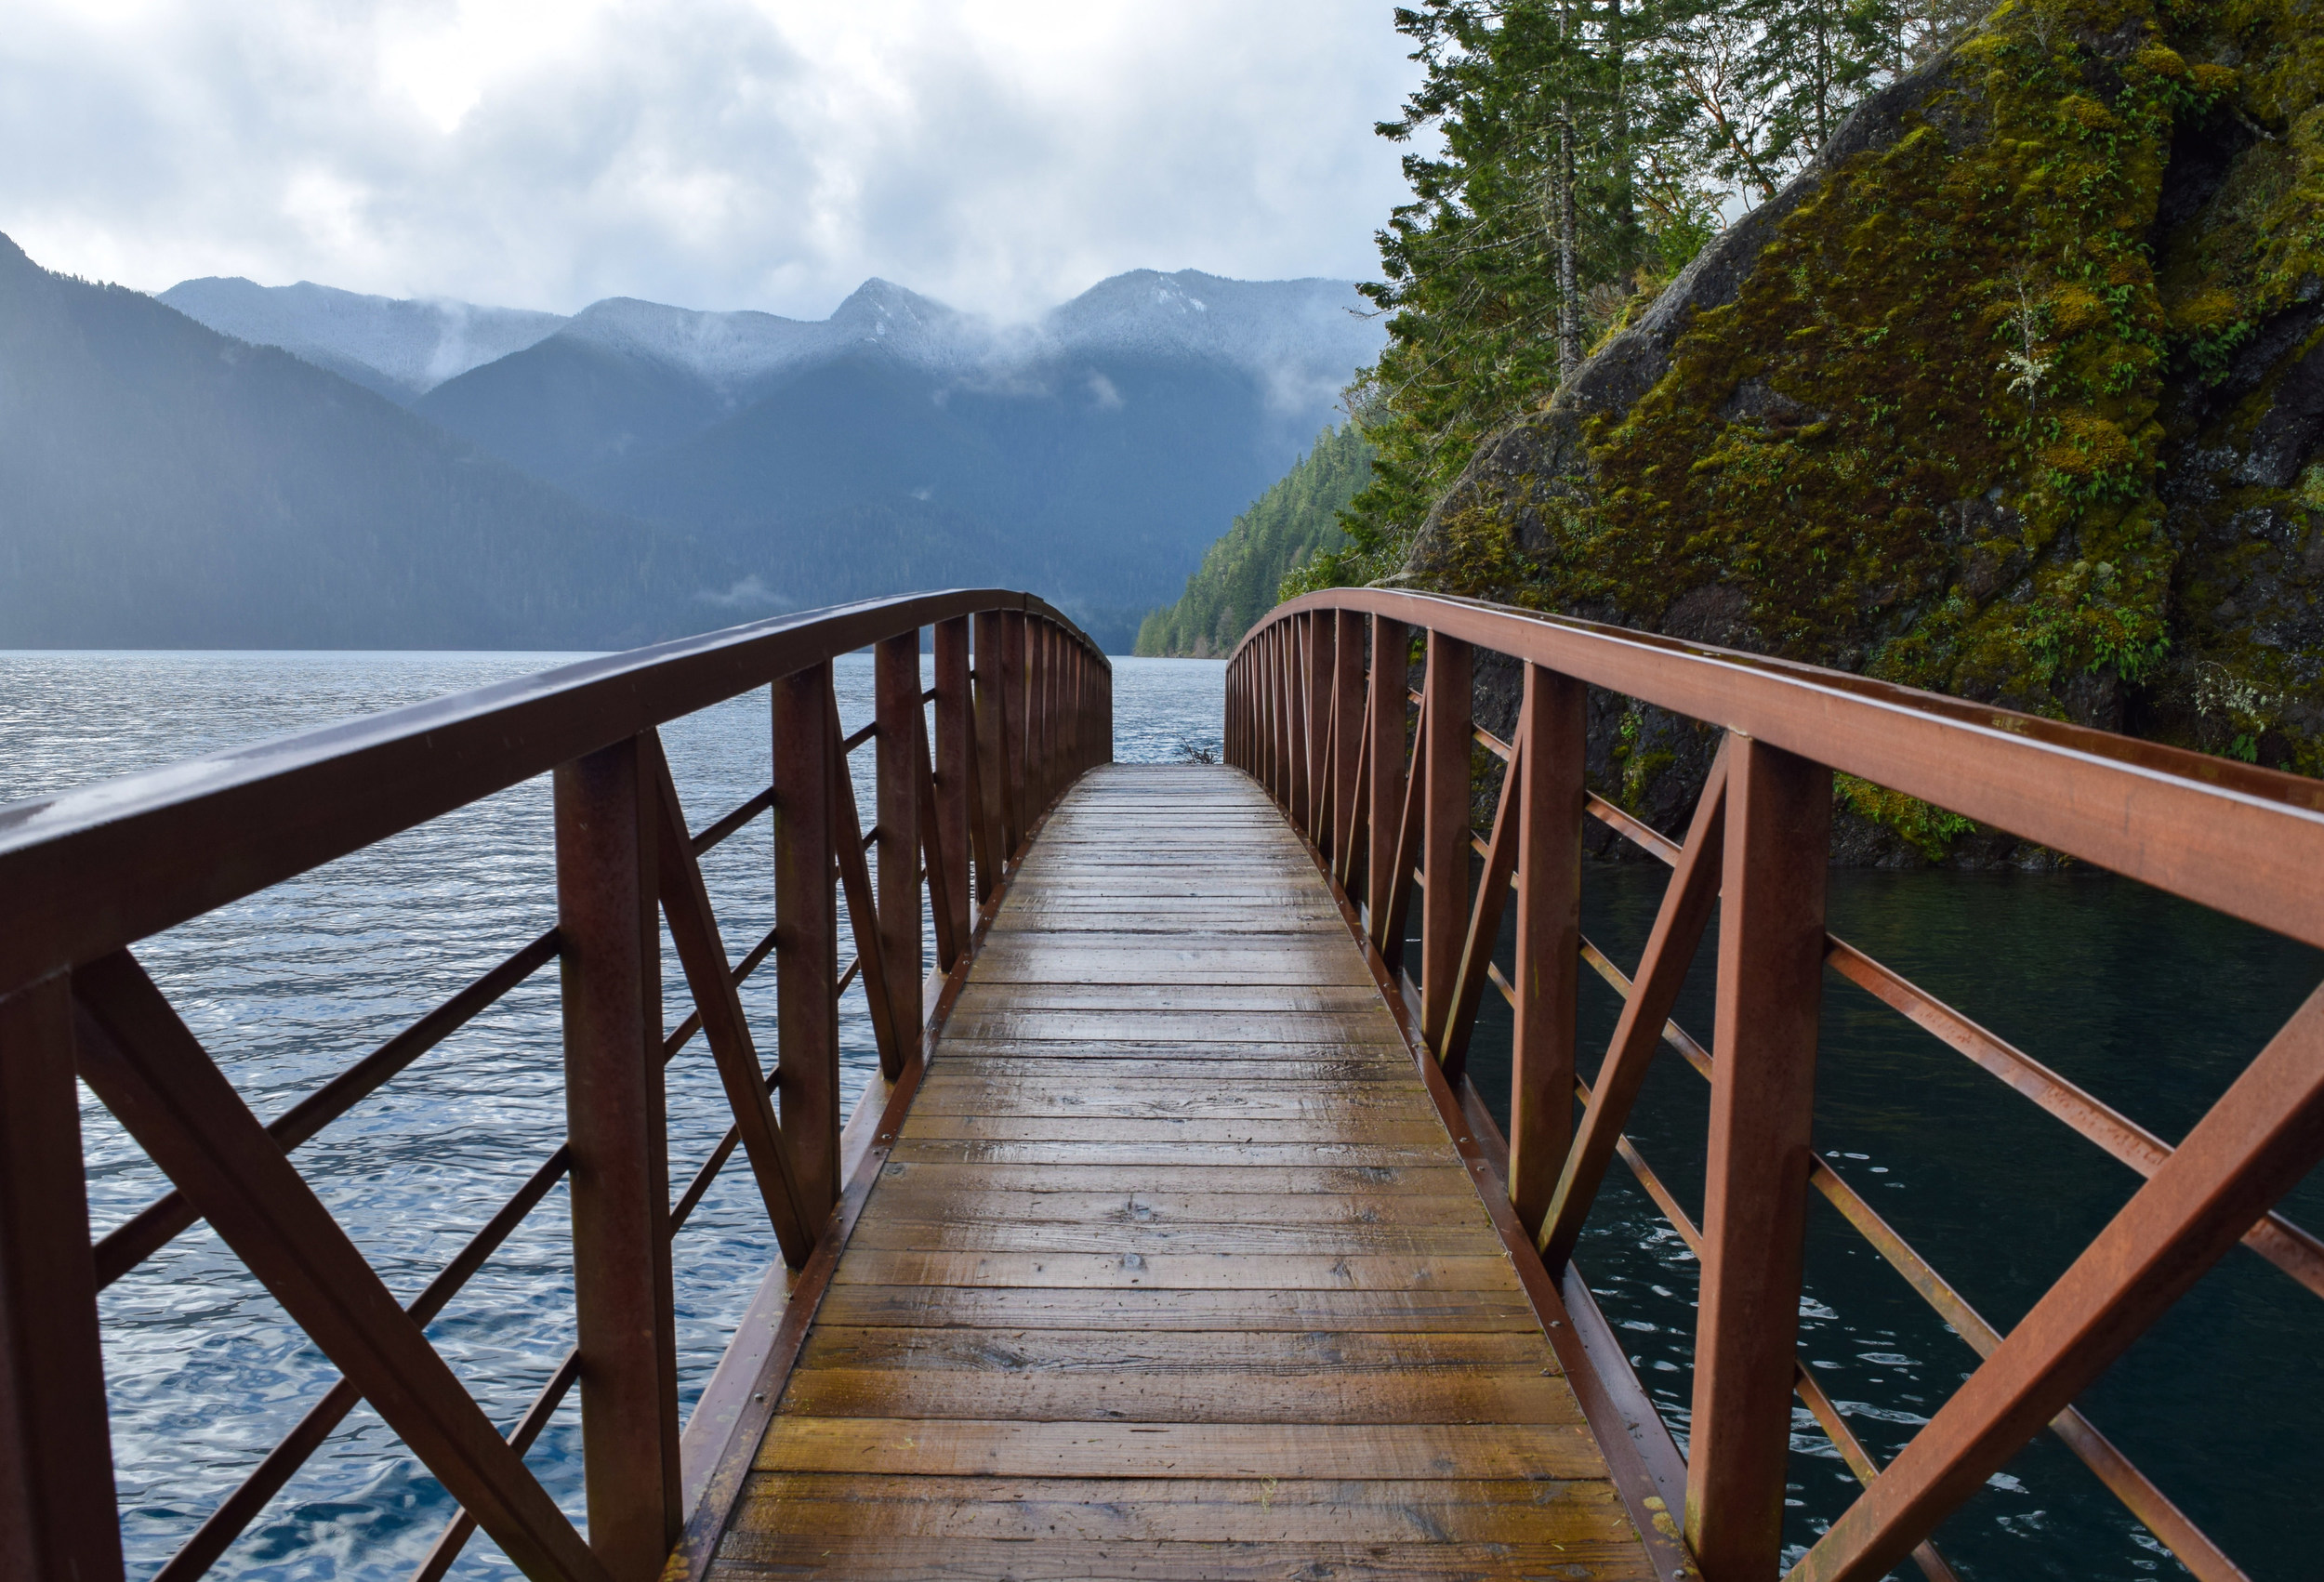 Custom Tour: Spruce Railroad Trail along Lake Crescent